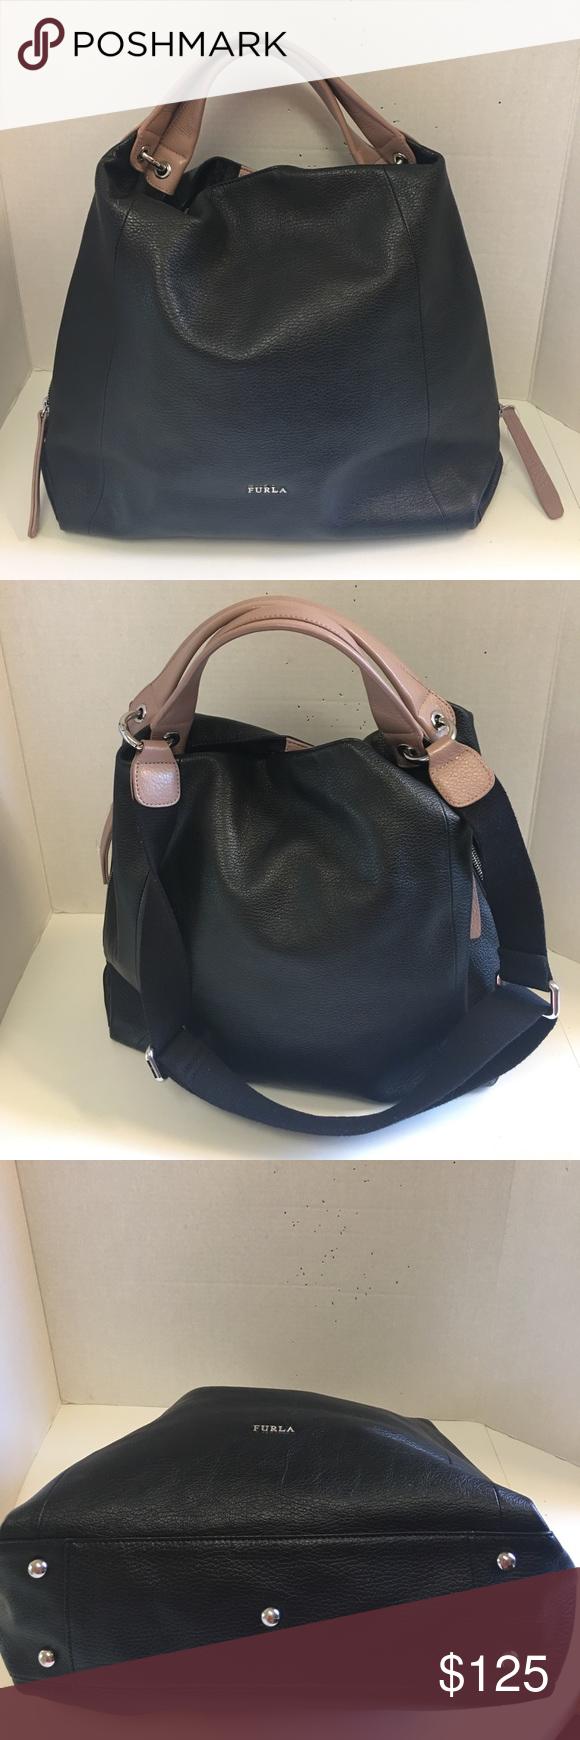 Furla Two Tone Convertible Leather Shoulder Bag Metropolis Bronze Authentic